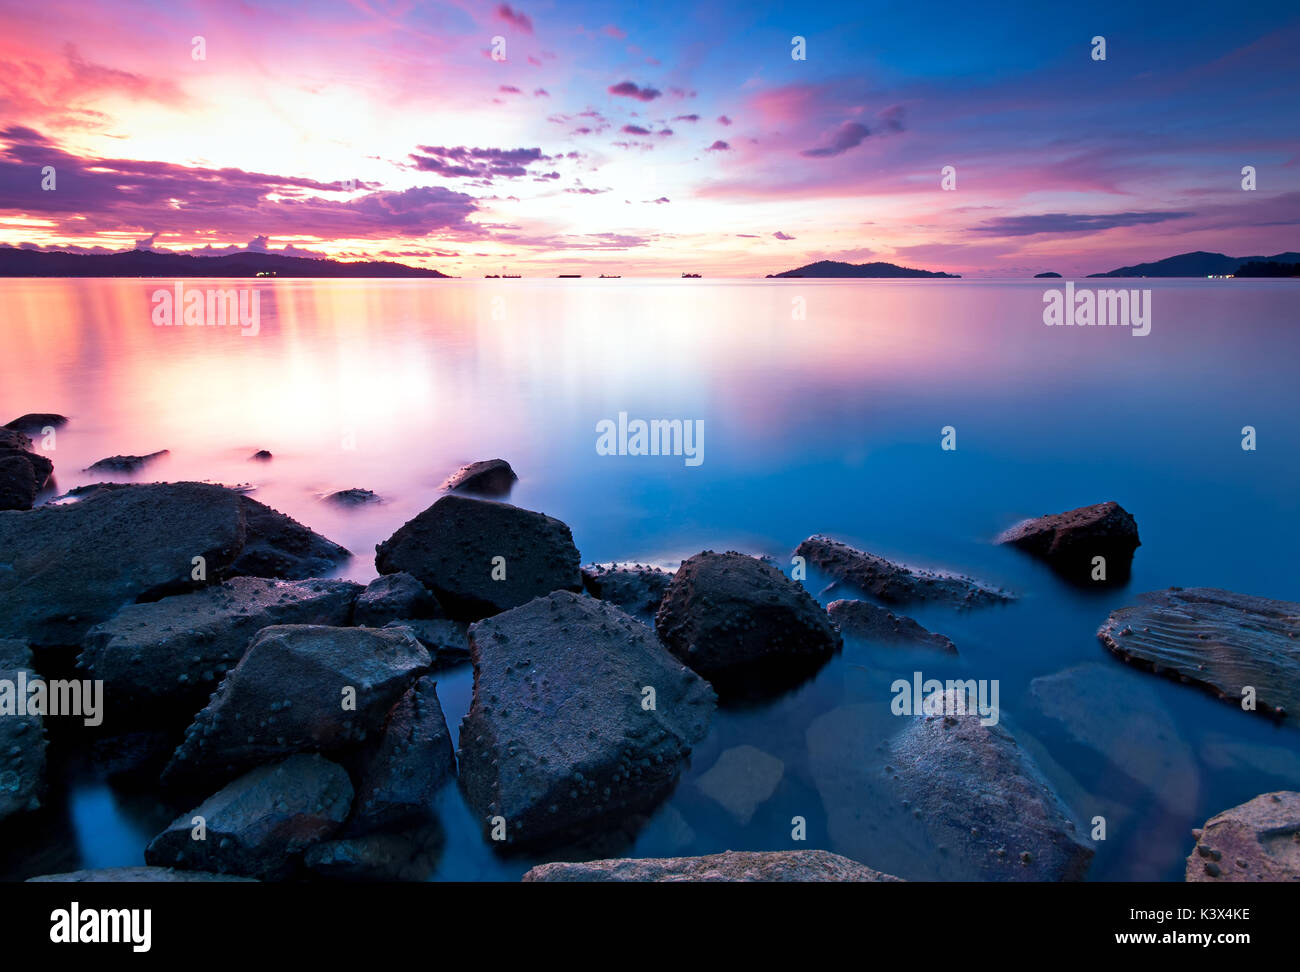 Vibrant and colorful sunset in Kota Kinabalu beach, Tanjung Lipat in Sabah Borneo, Malaysia. - Stock Image